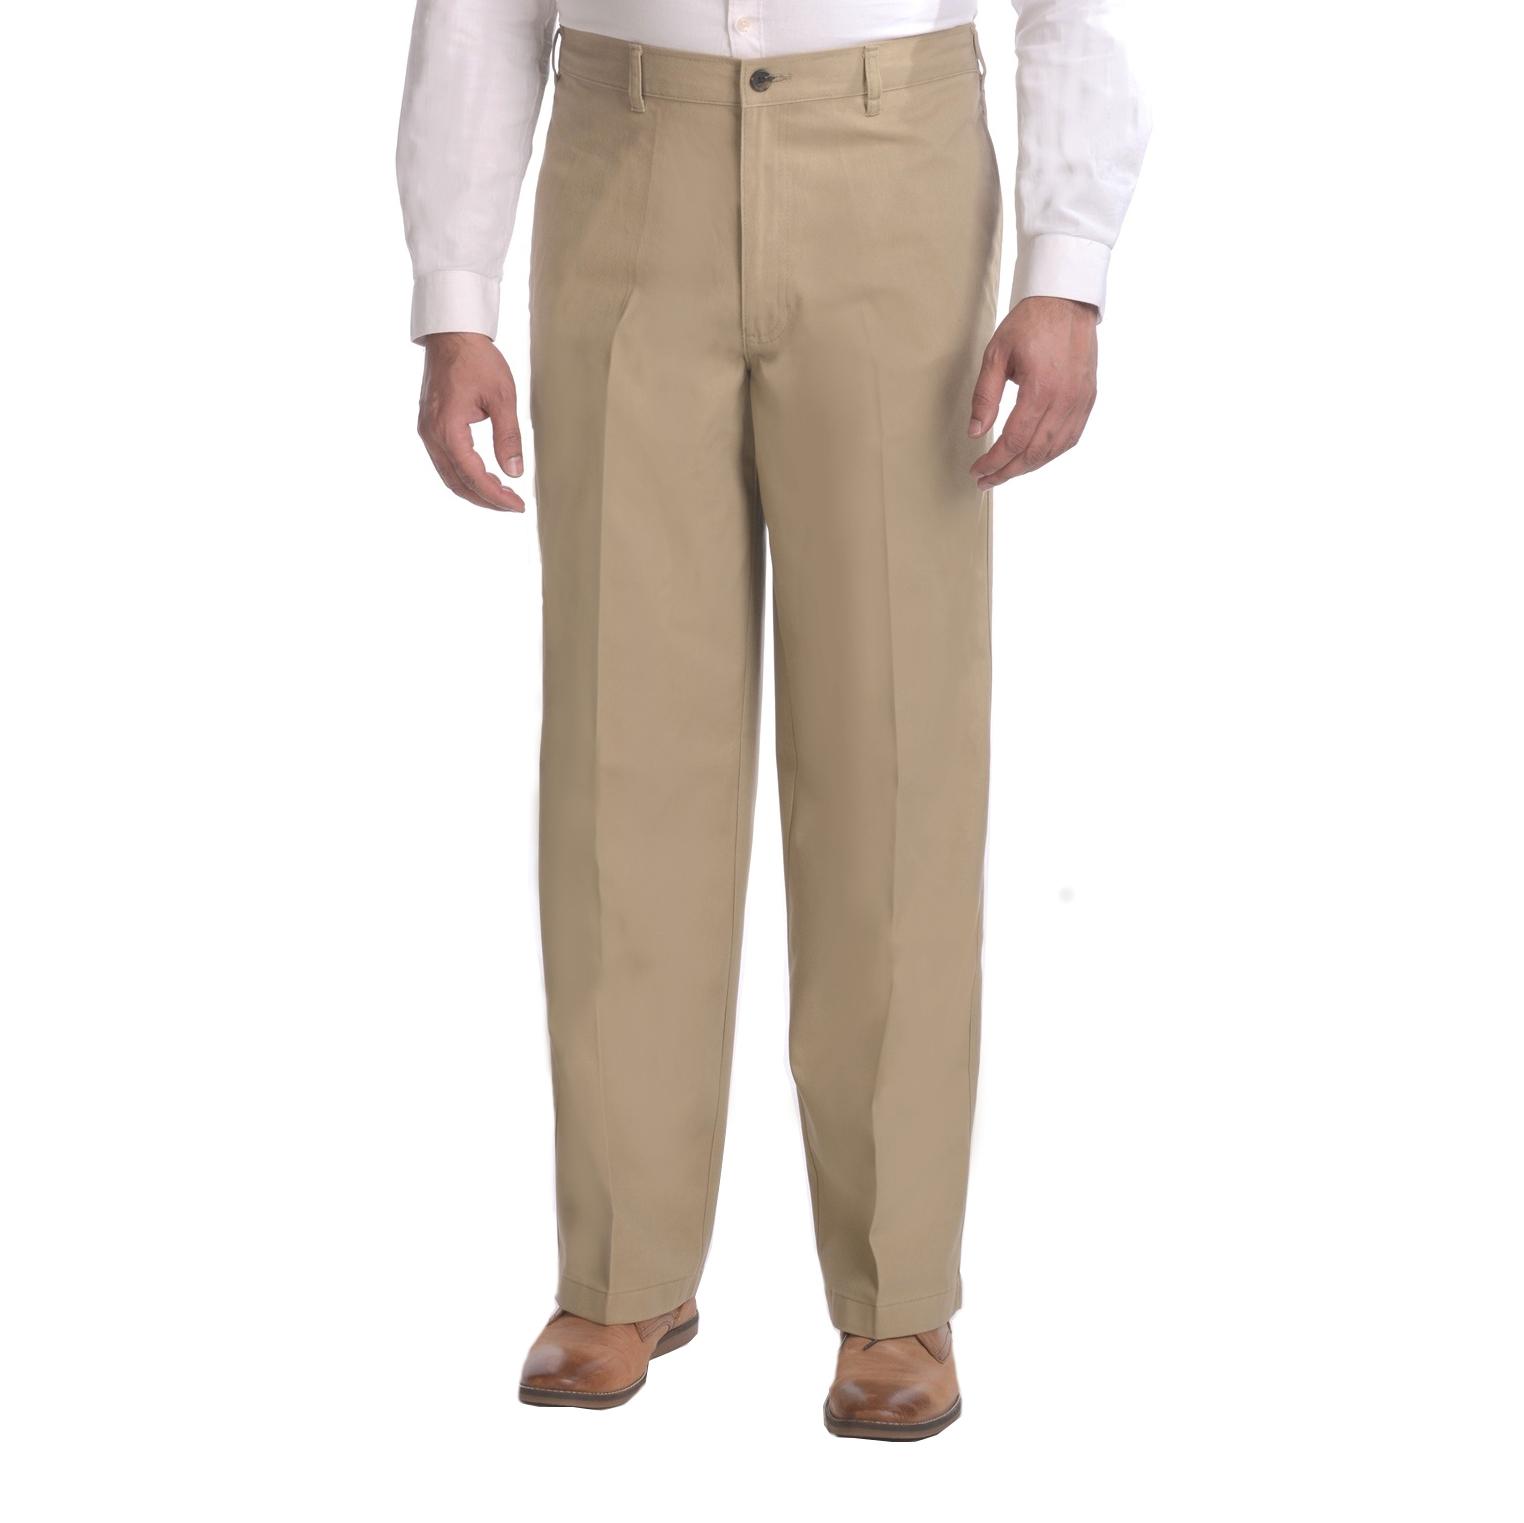 George Big Men's Elastic Twill Pant